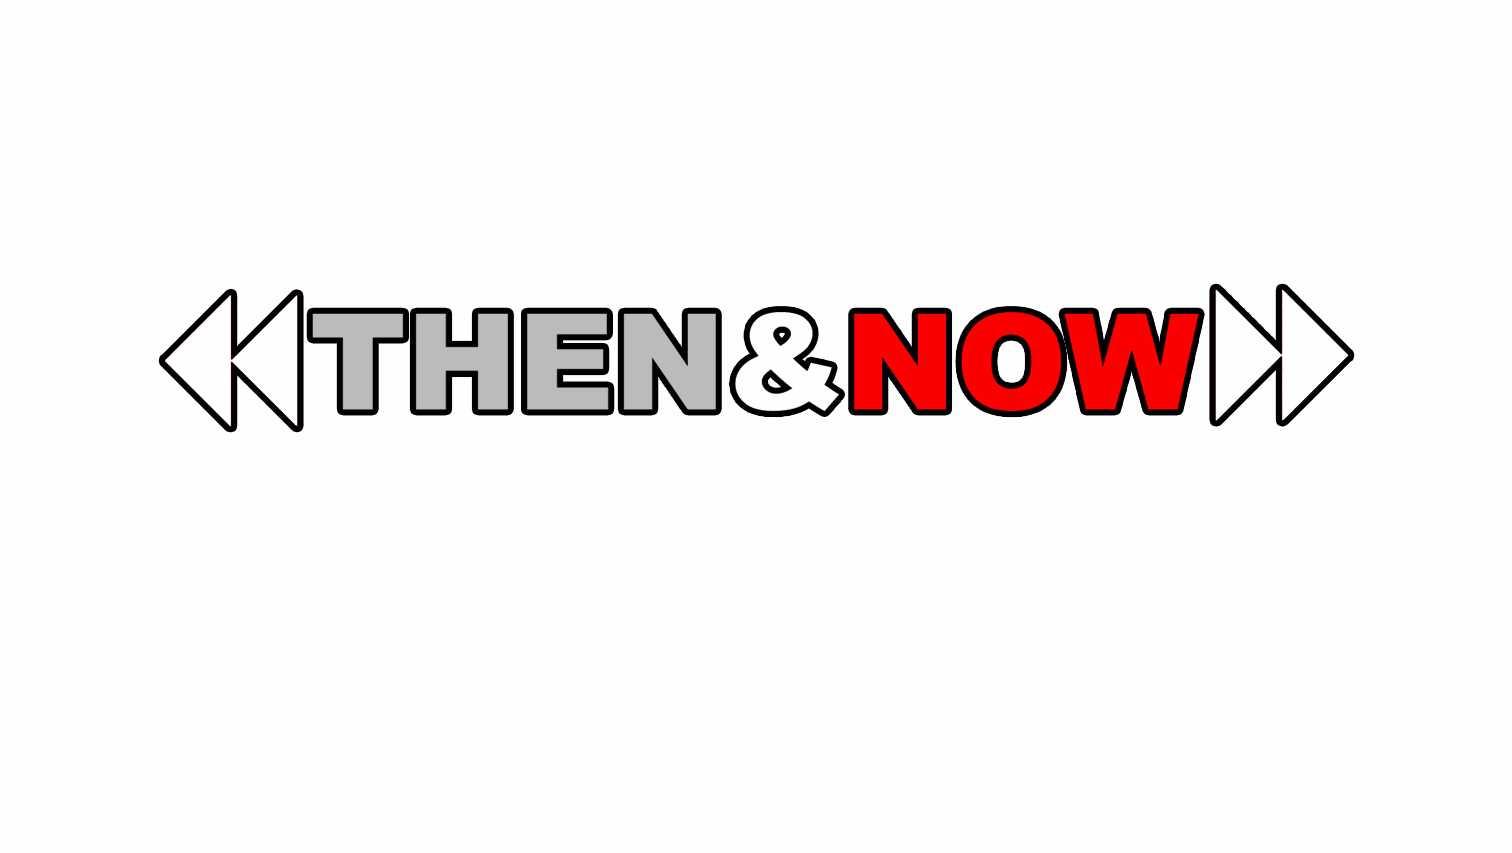 then & now_1530842540910.jpg.jpg